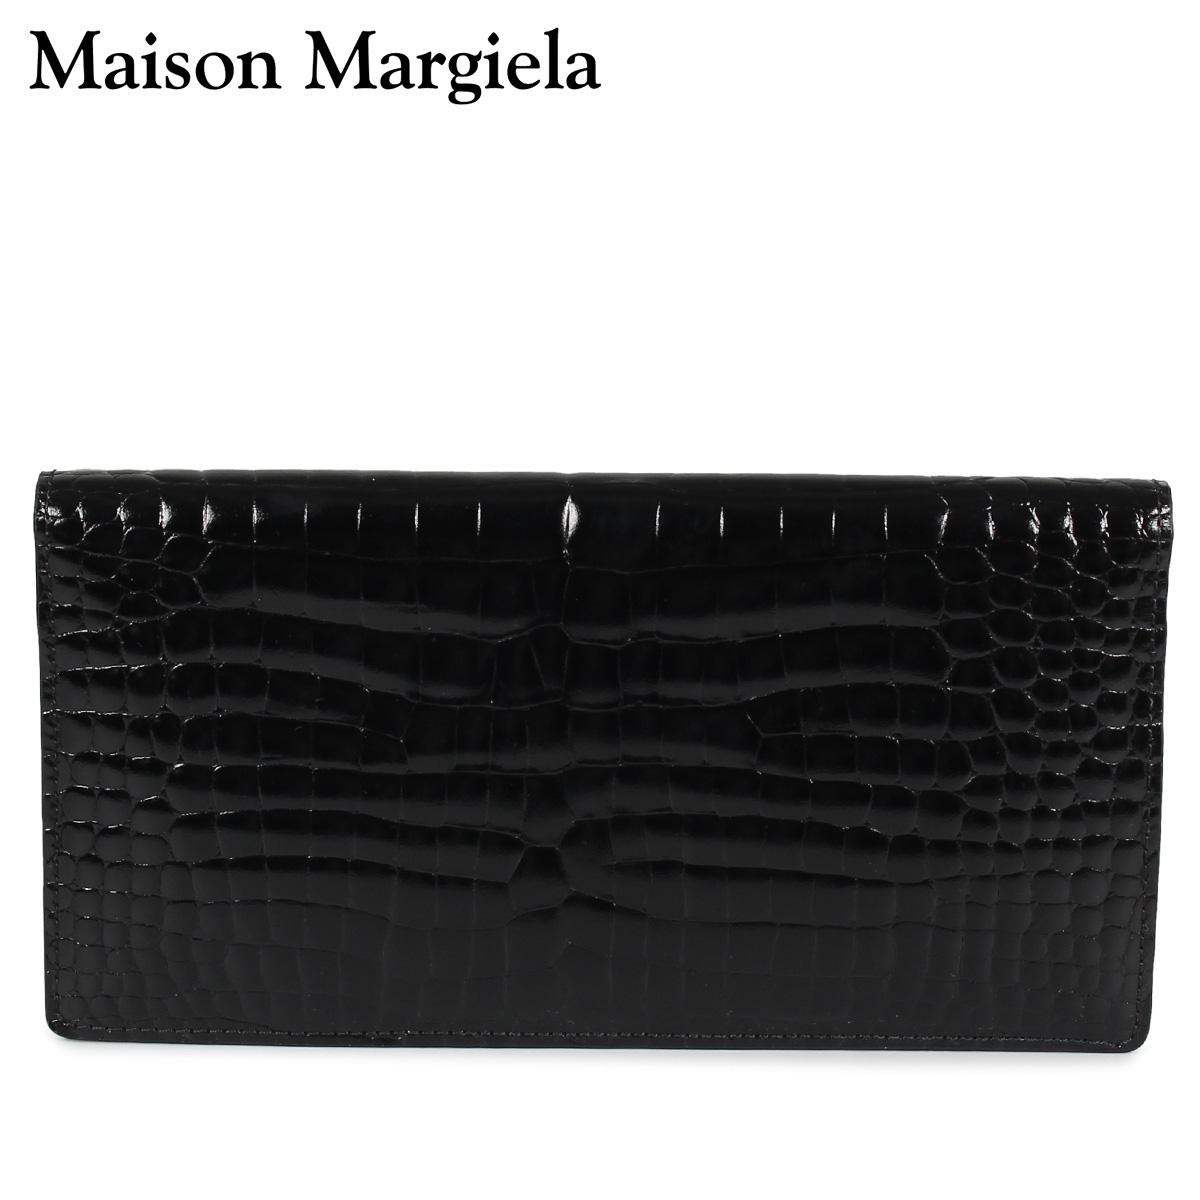 MAISON MARGIELA LONG WALLET メゾンマルジェラ 財布 長財布 メンズ レザー ブラック 黒 S55UI0202 P0195 [10/8 新入荷]